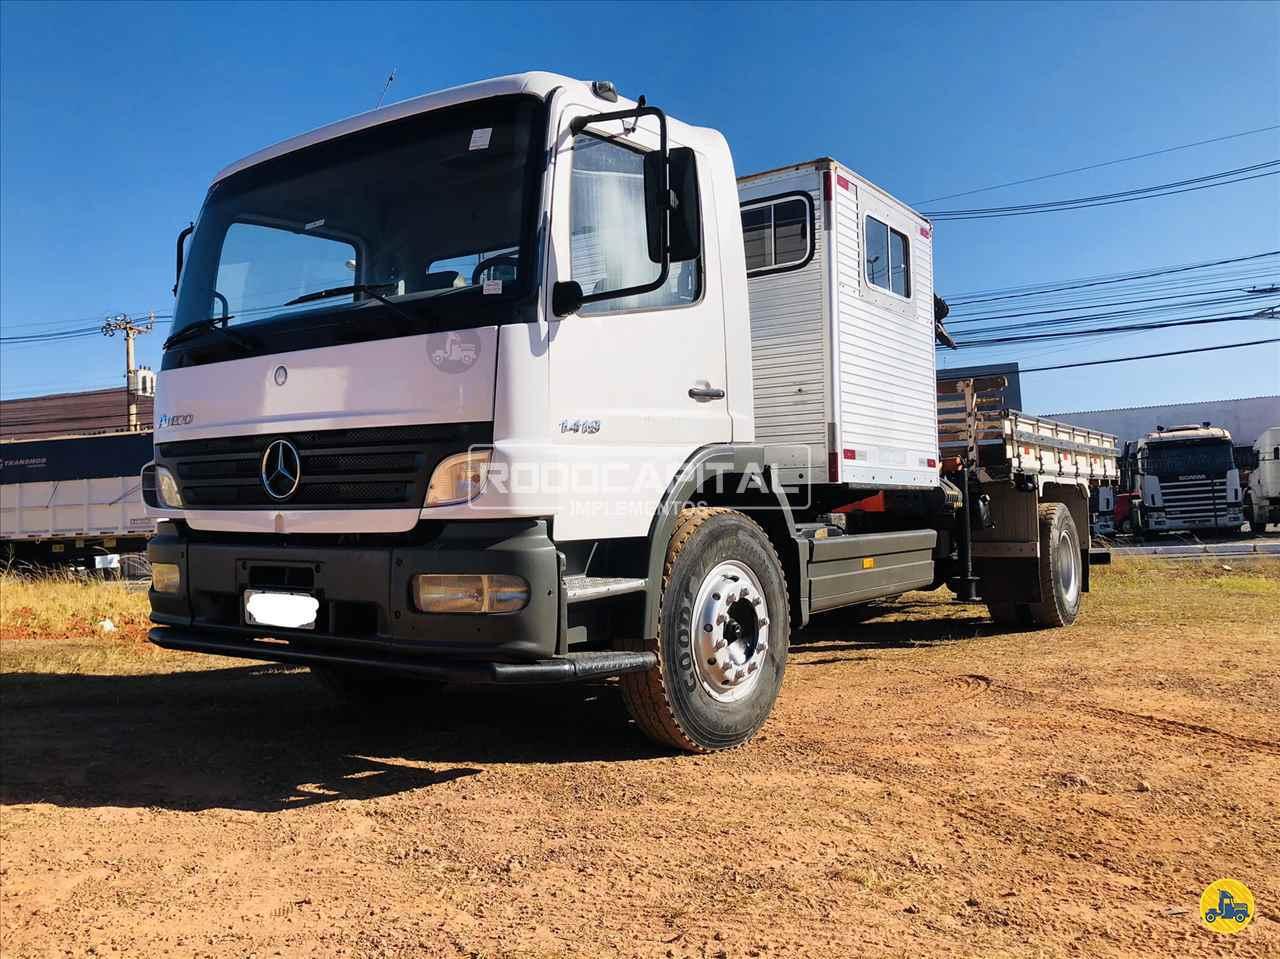 CAMINHAO MERCEDES-BENZ MB 1418 Guincho Munck 3/4 4x2 RODOCAPITAL - TRUCKVAN BRASILIA DISTRITO FEDERAL DF